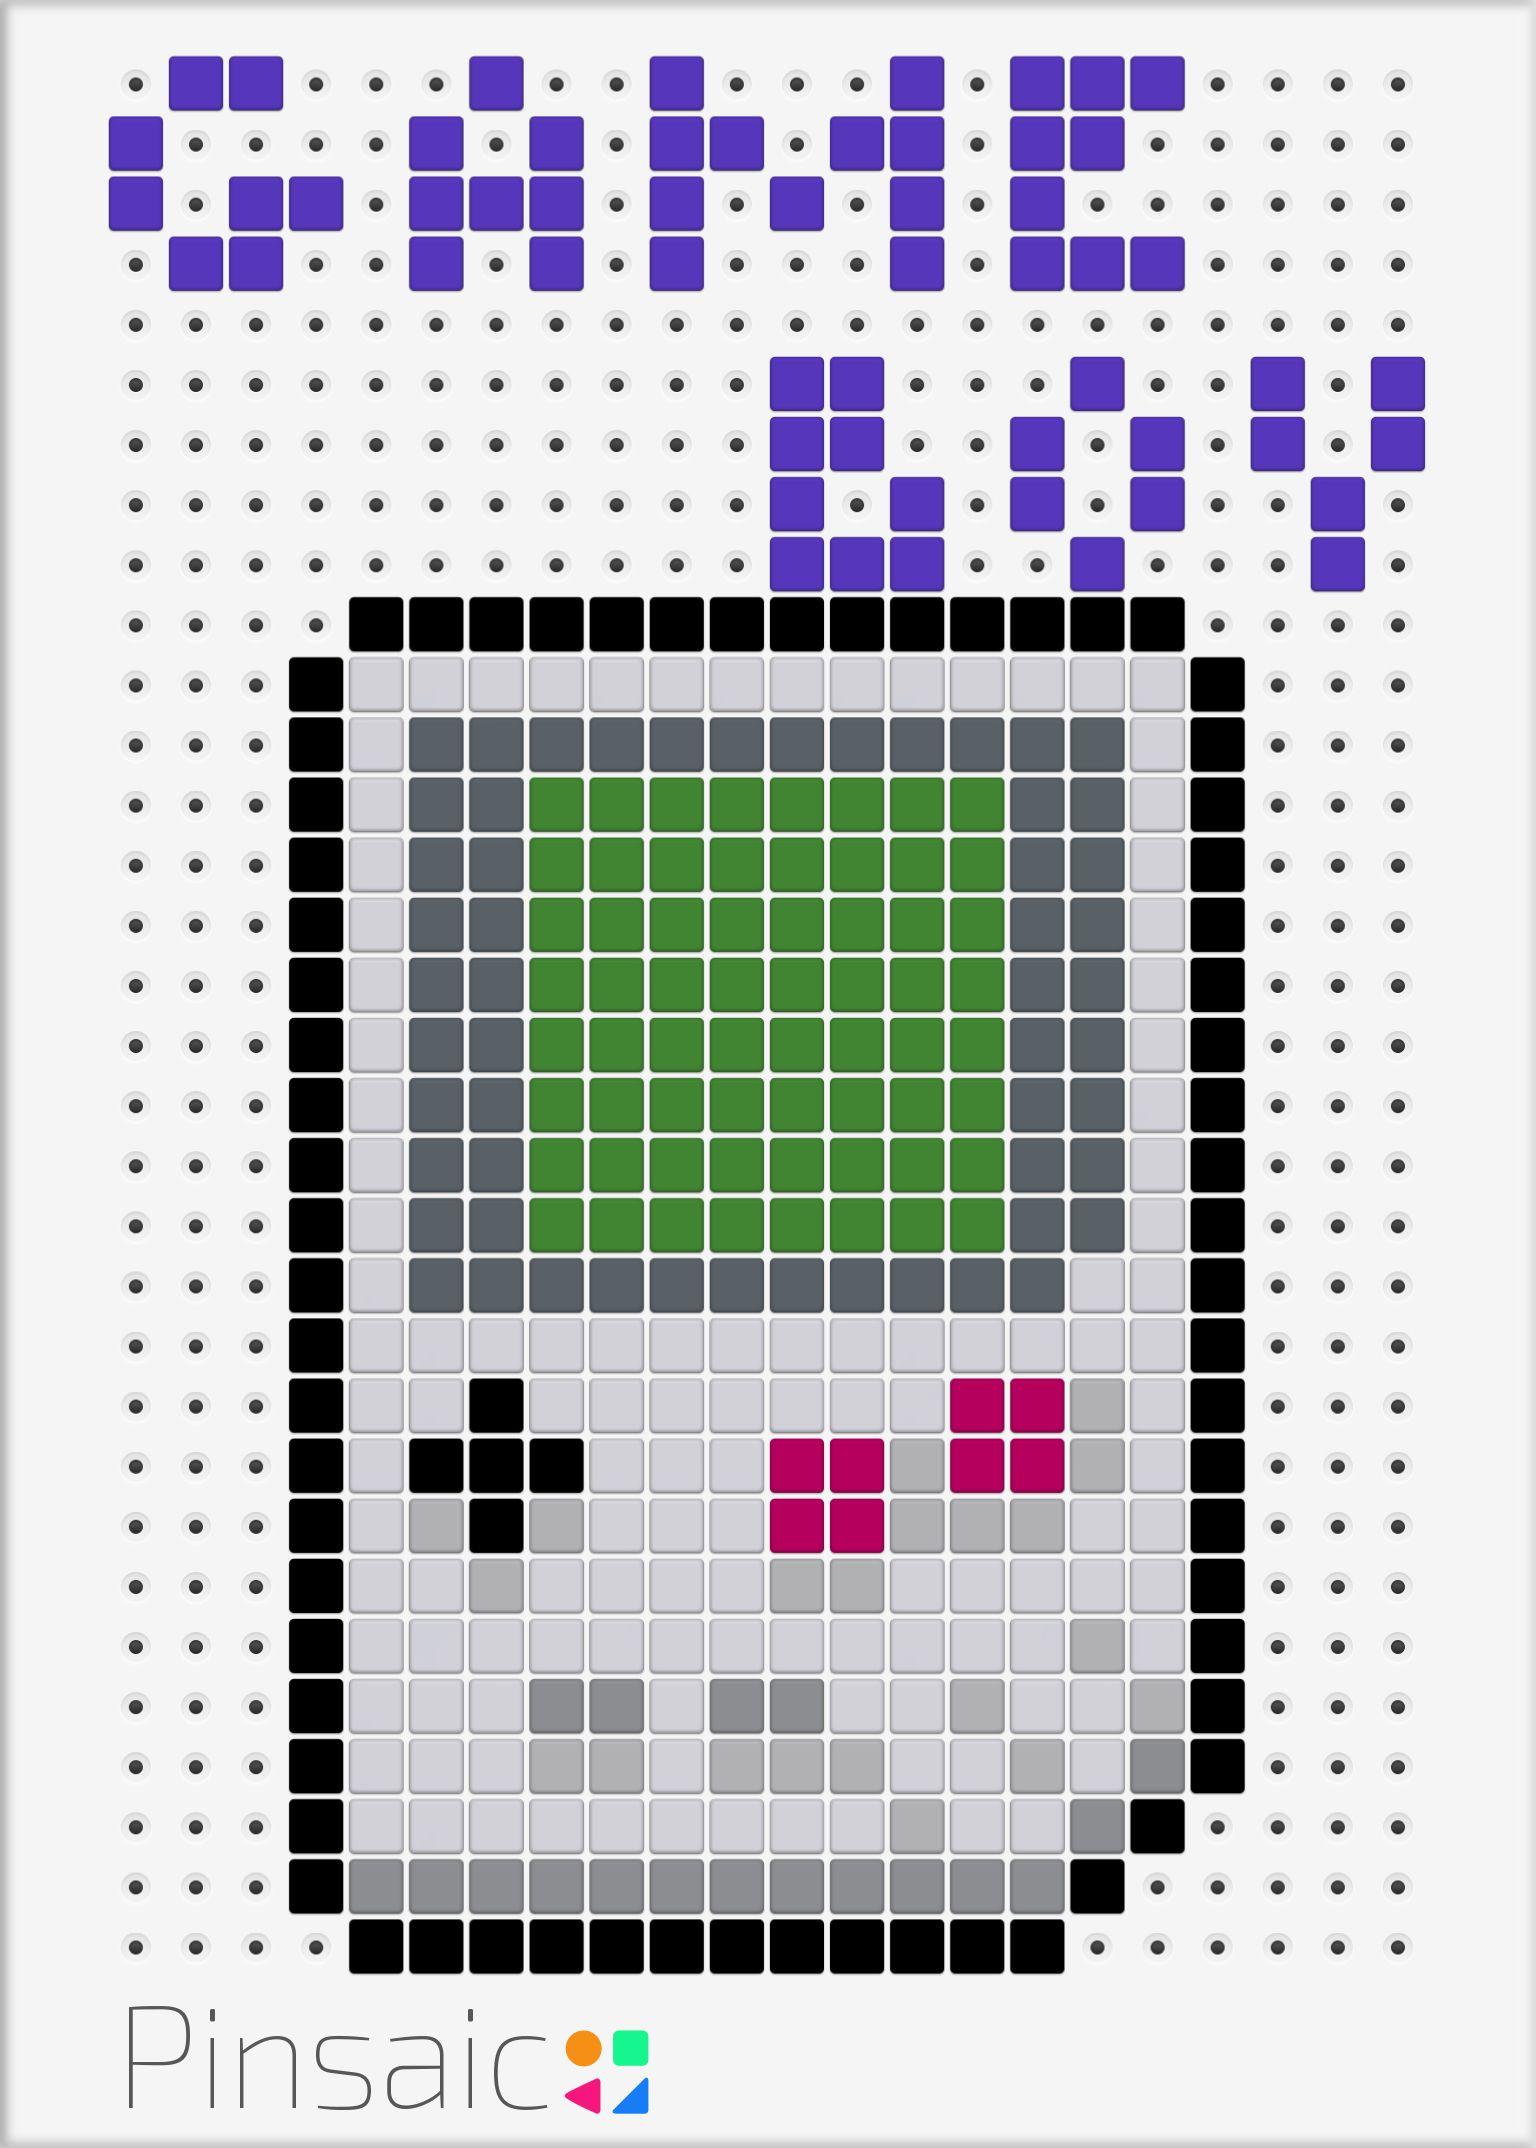 Game Boy - Happy 25th anniversary